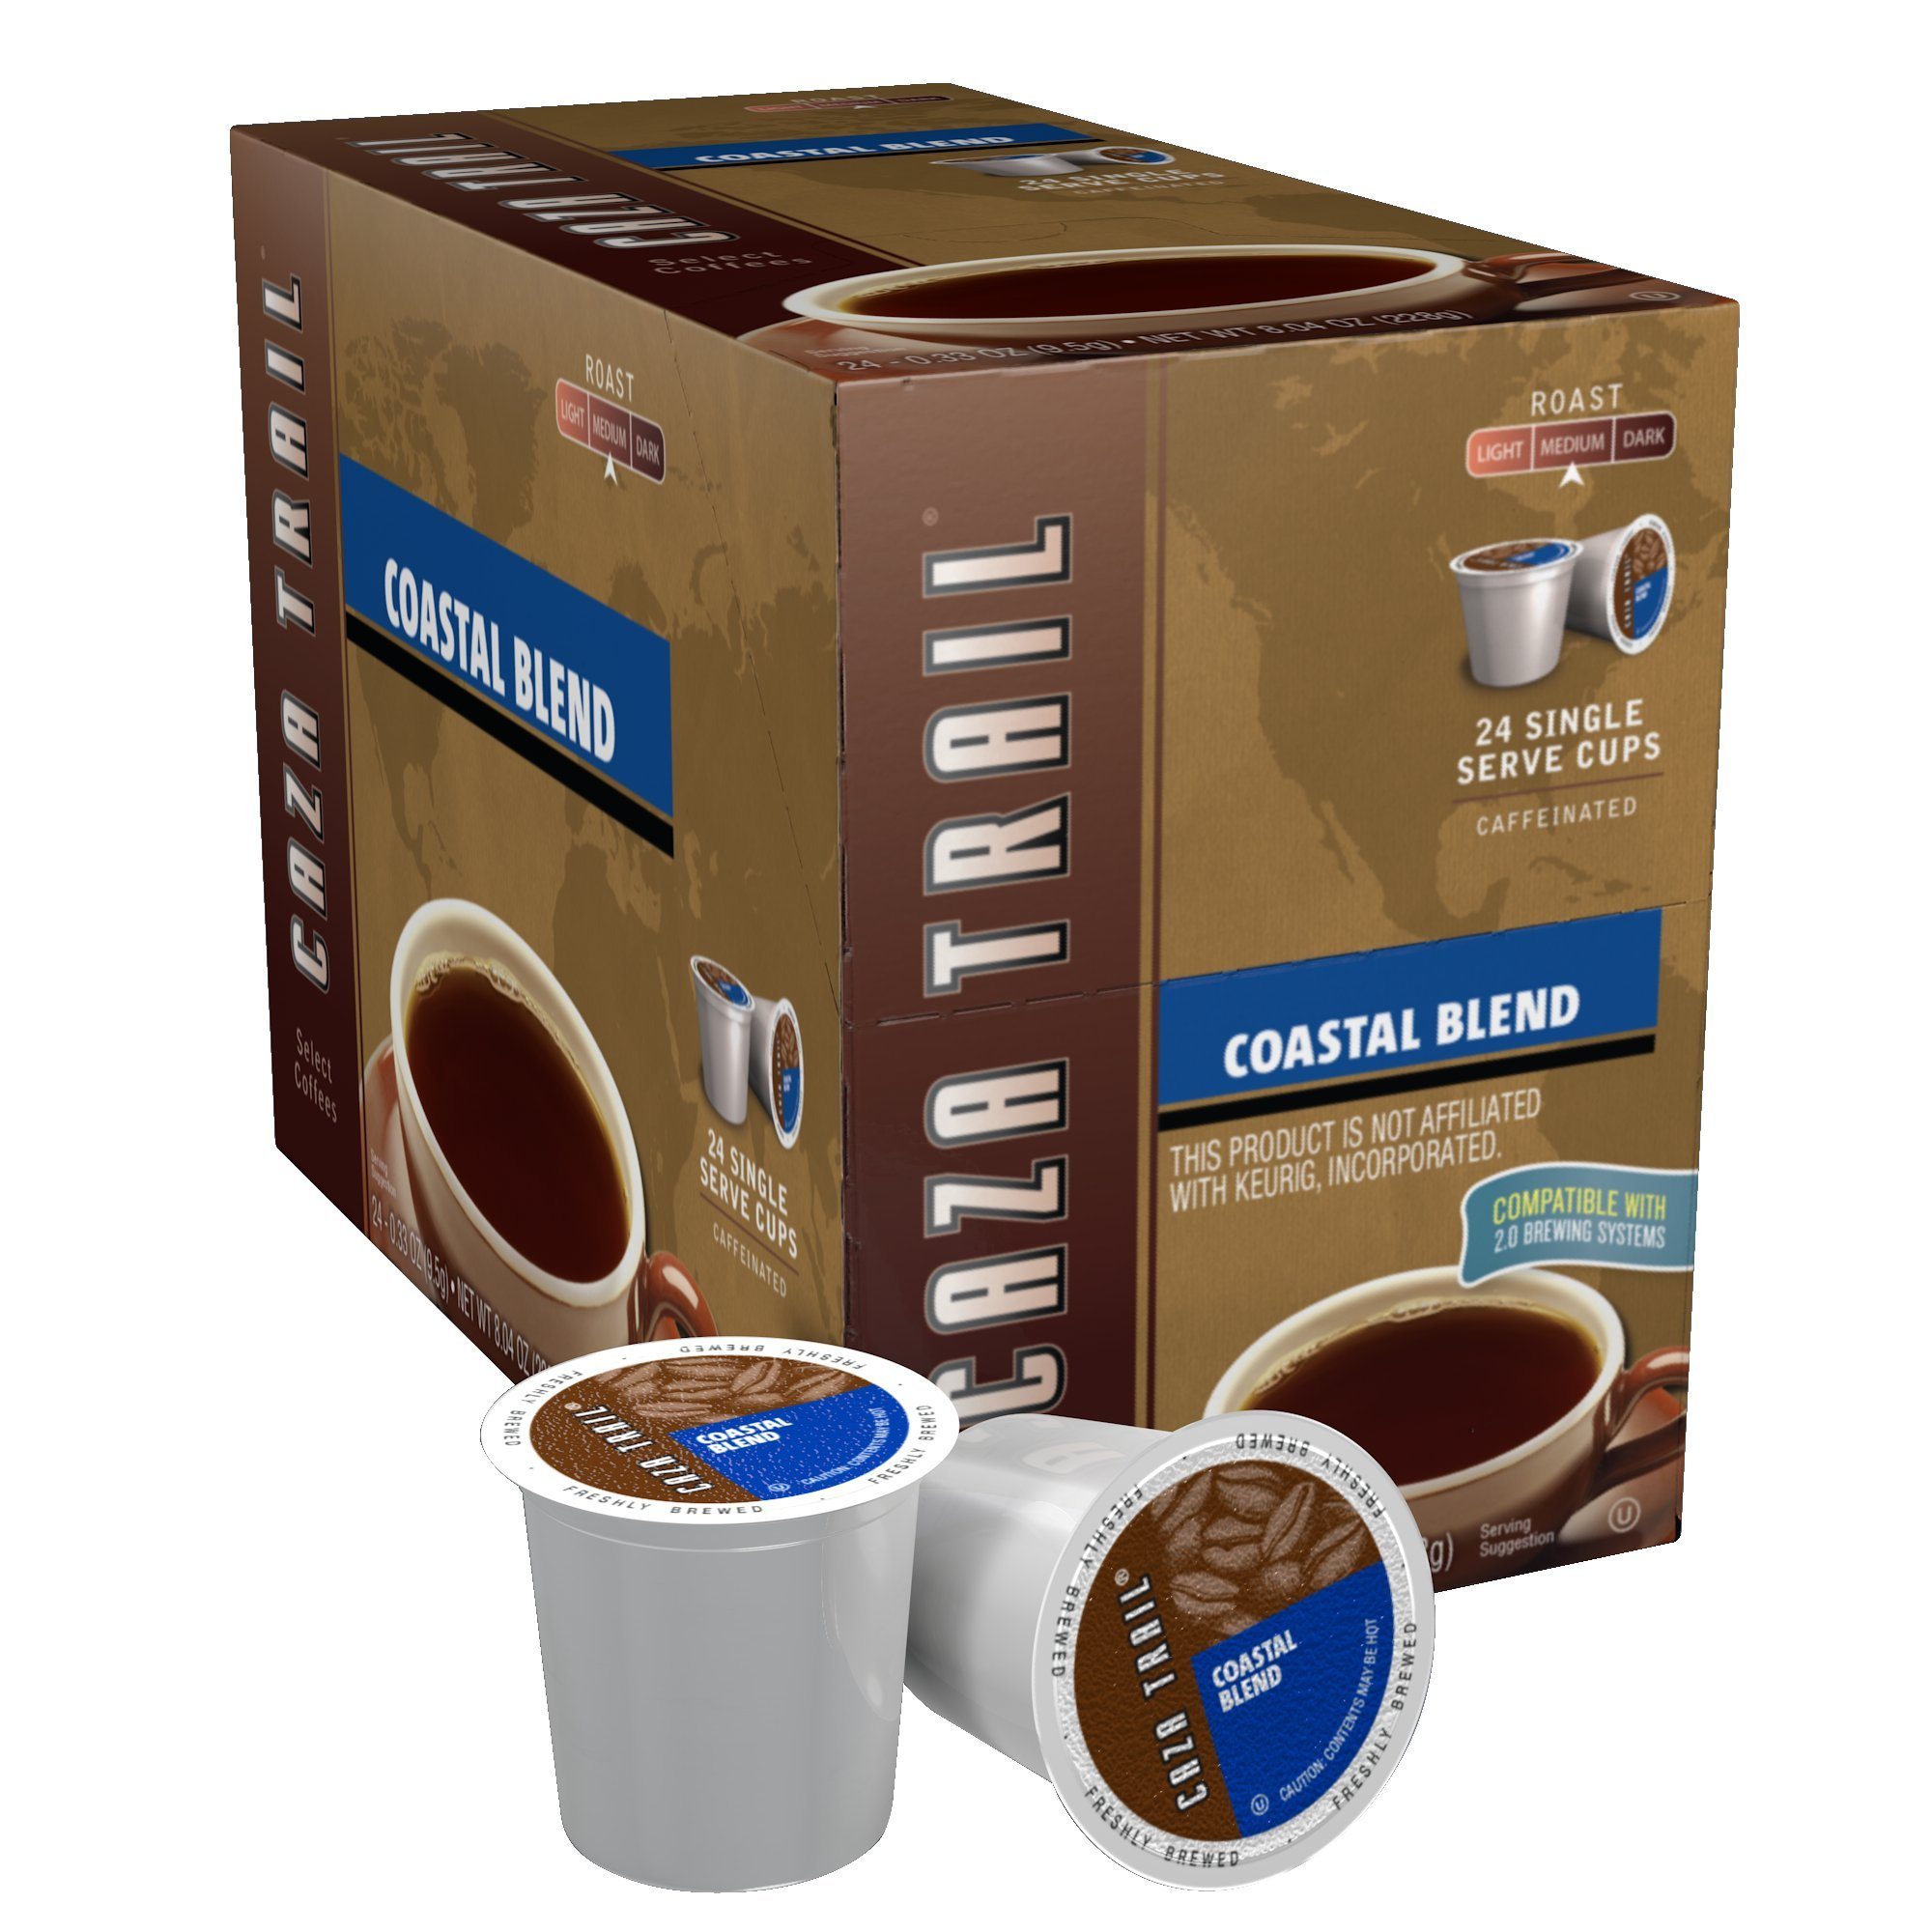 Caza Trail Coffee, Coastal Blend, 24 Single Serve Cups